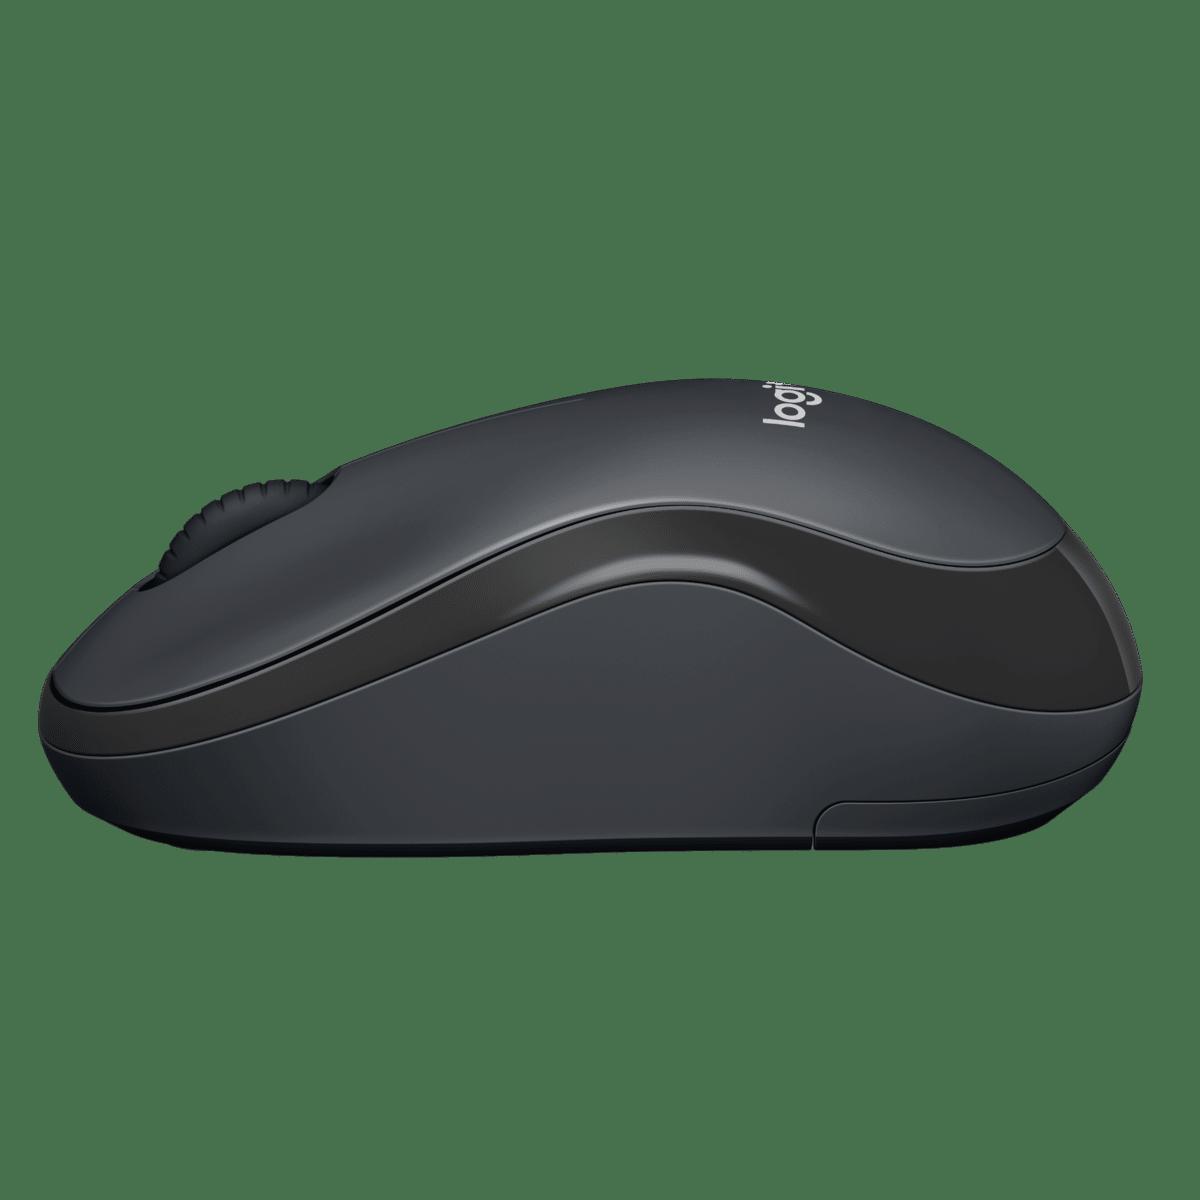 Mouse M220 Silent, da Logitech